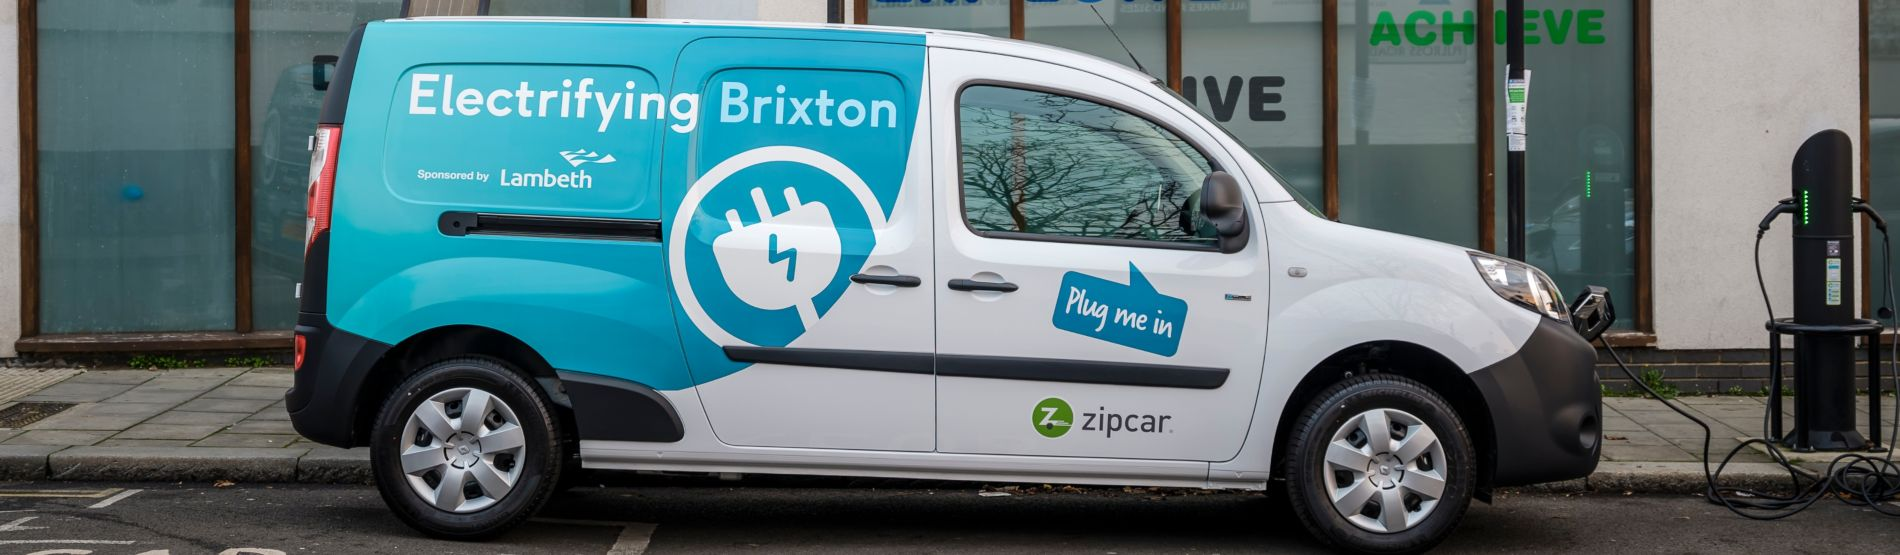 zipcar shared electric van